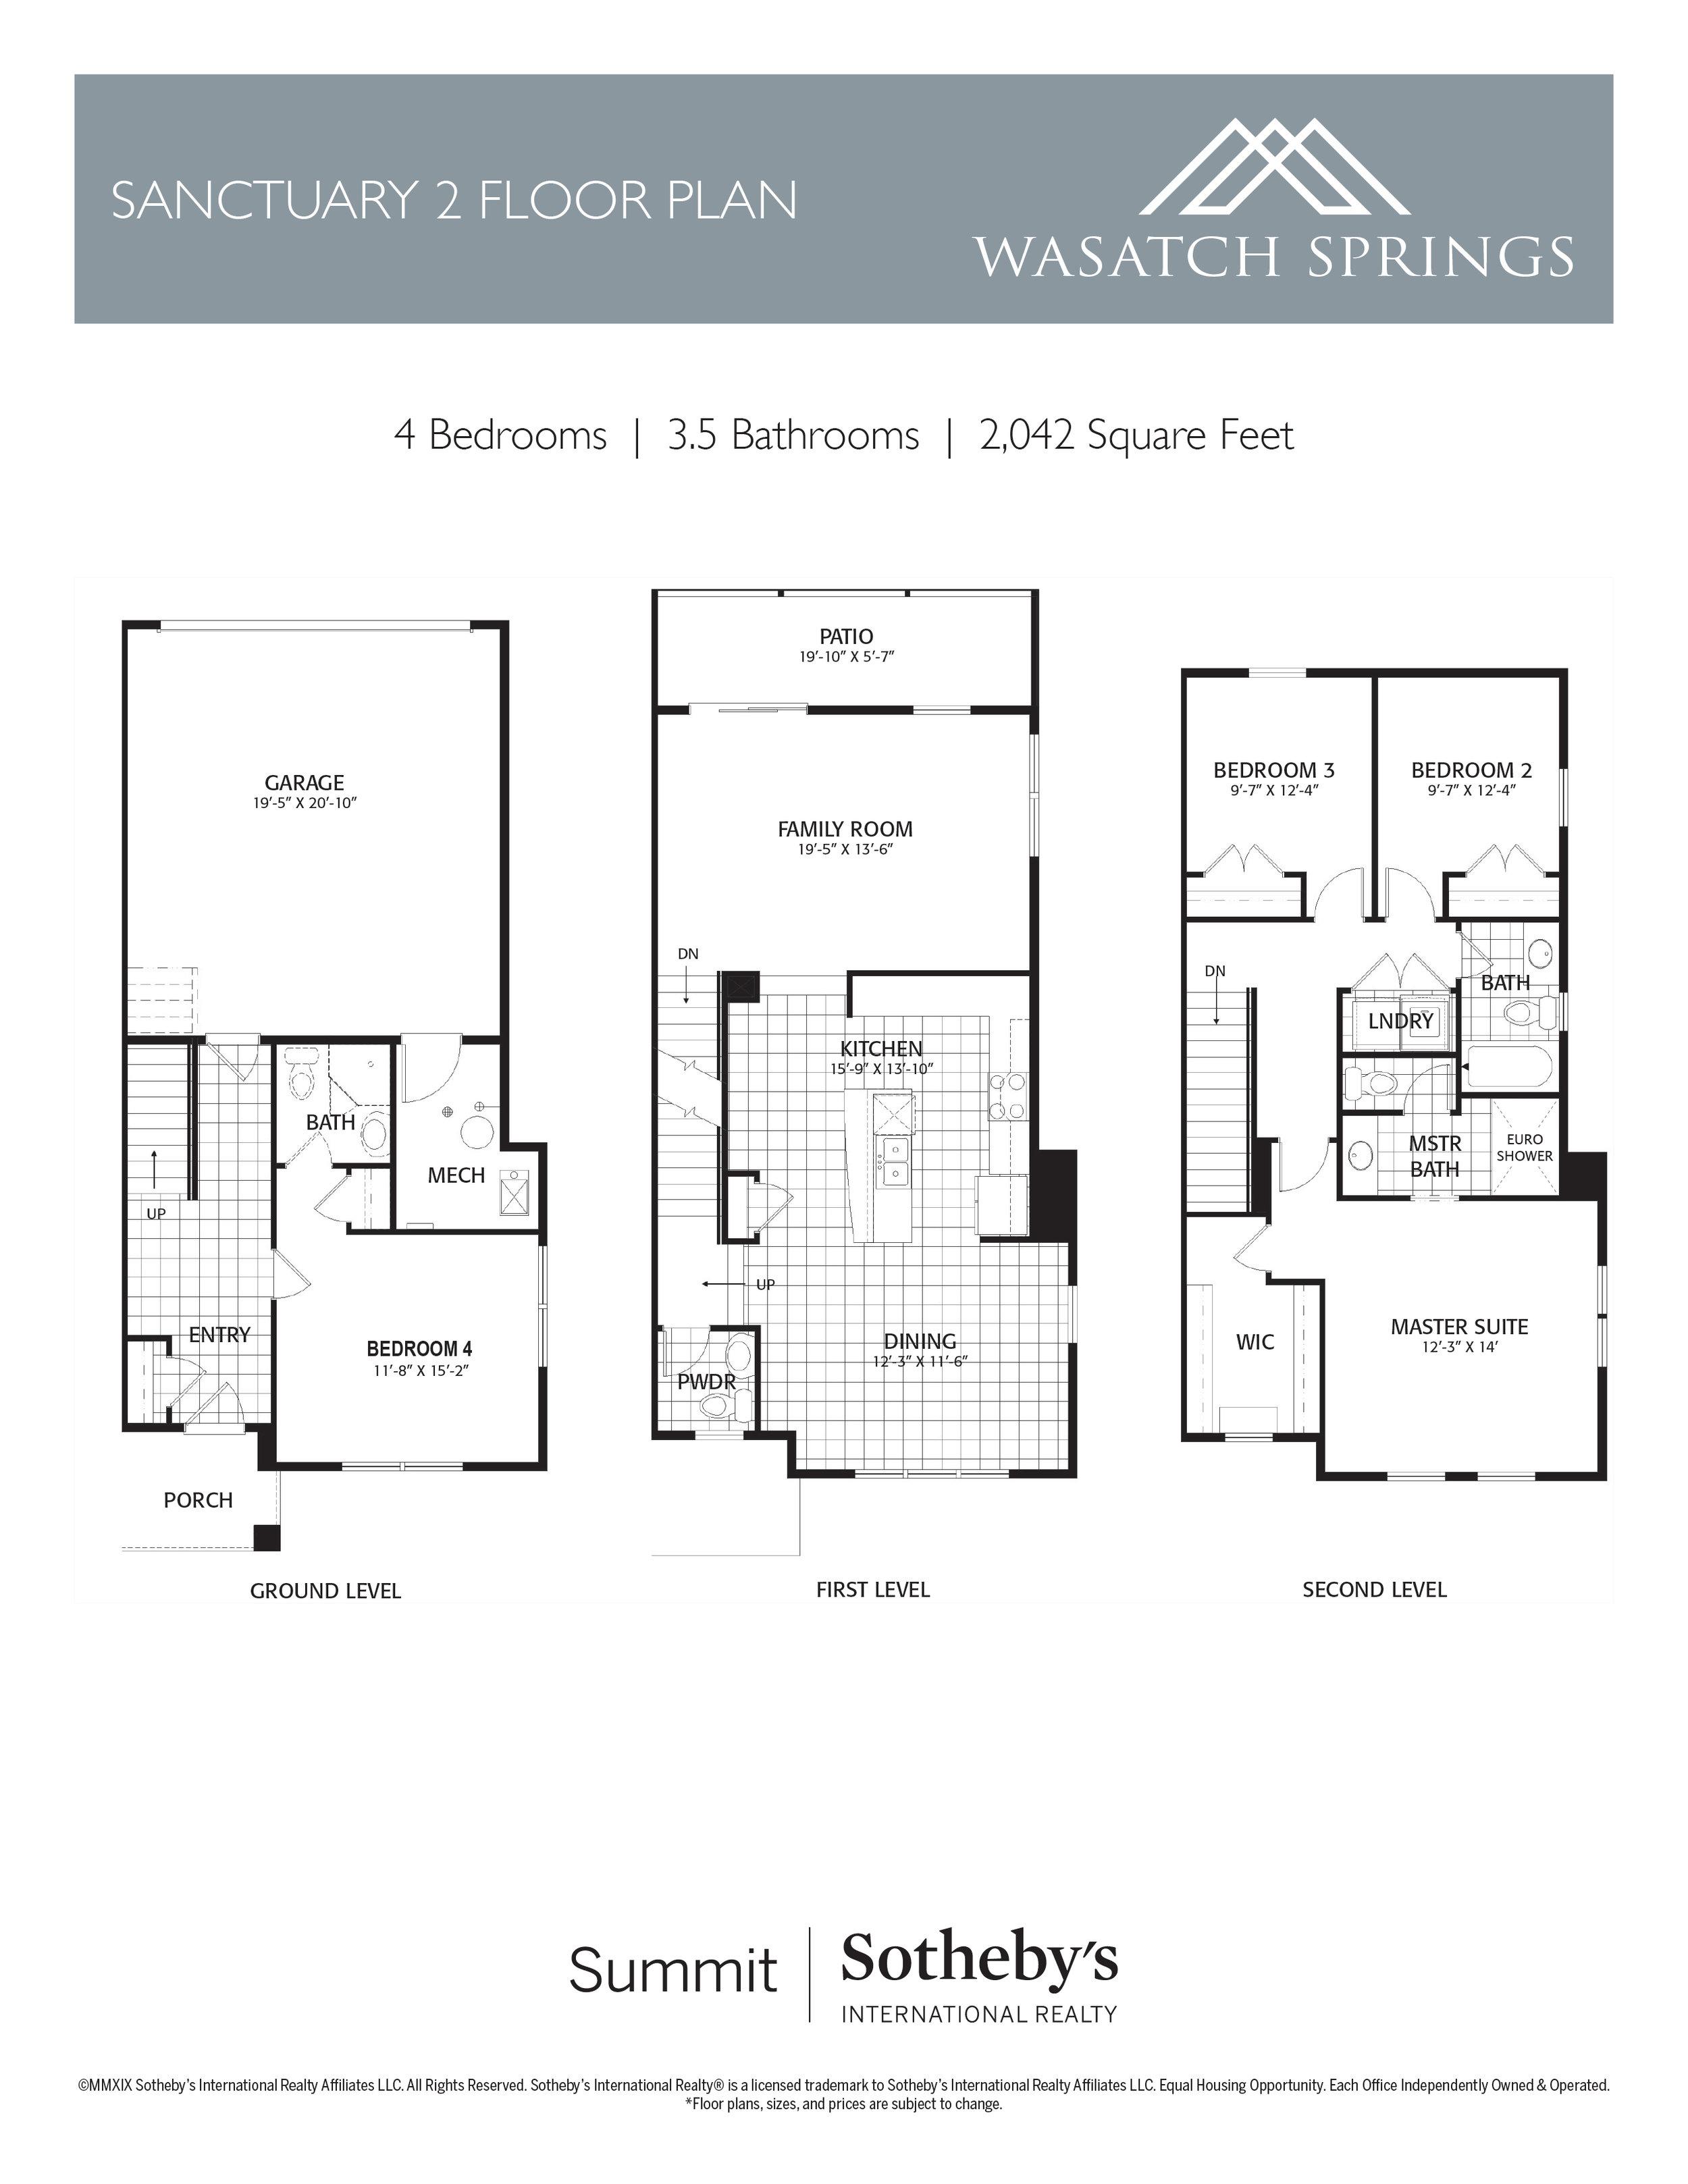 Sanctuary 2 Floor Plan.jpg